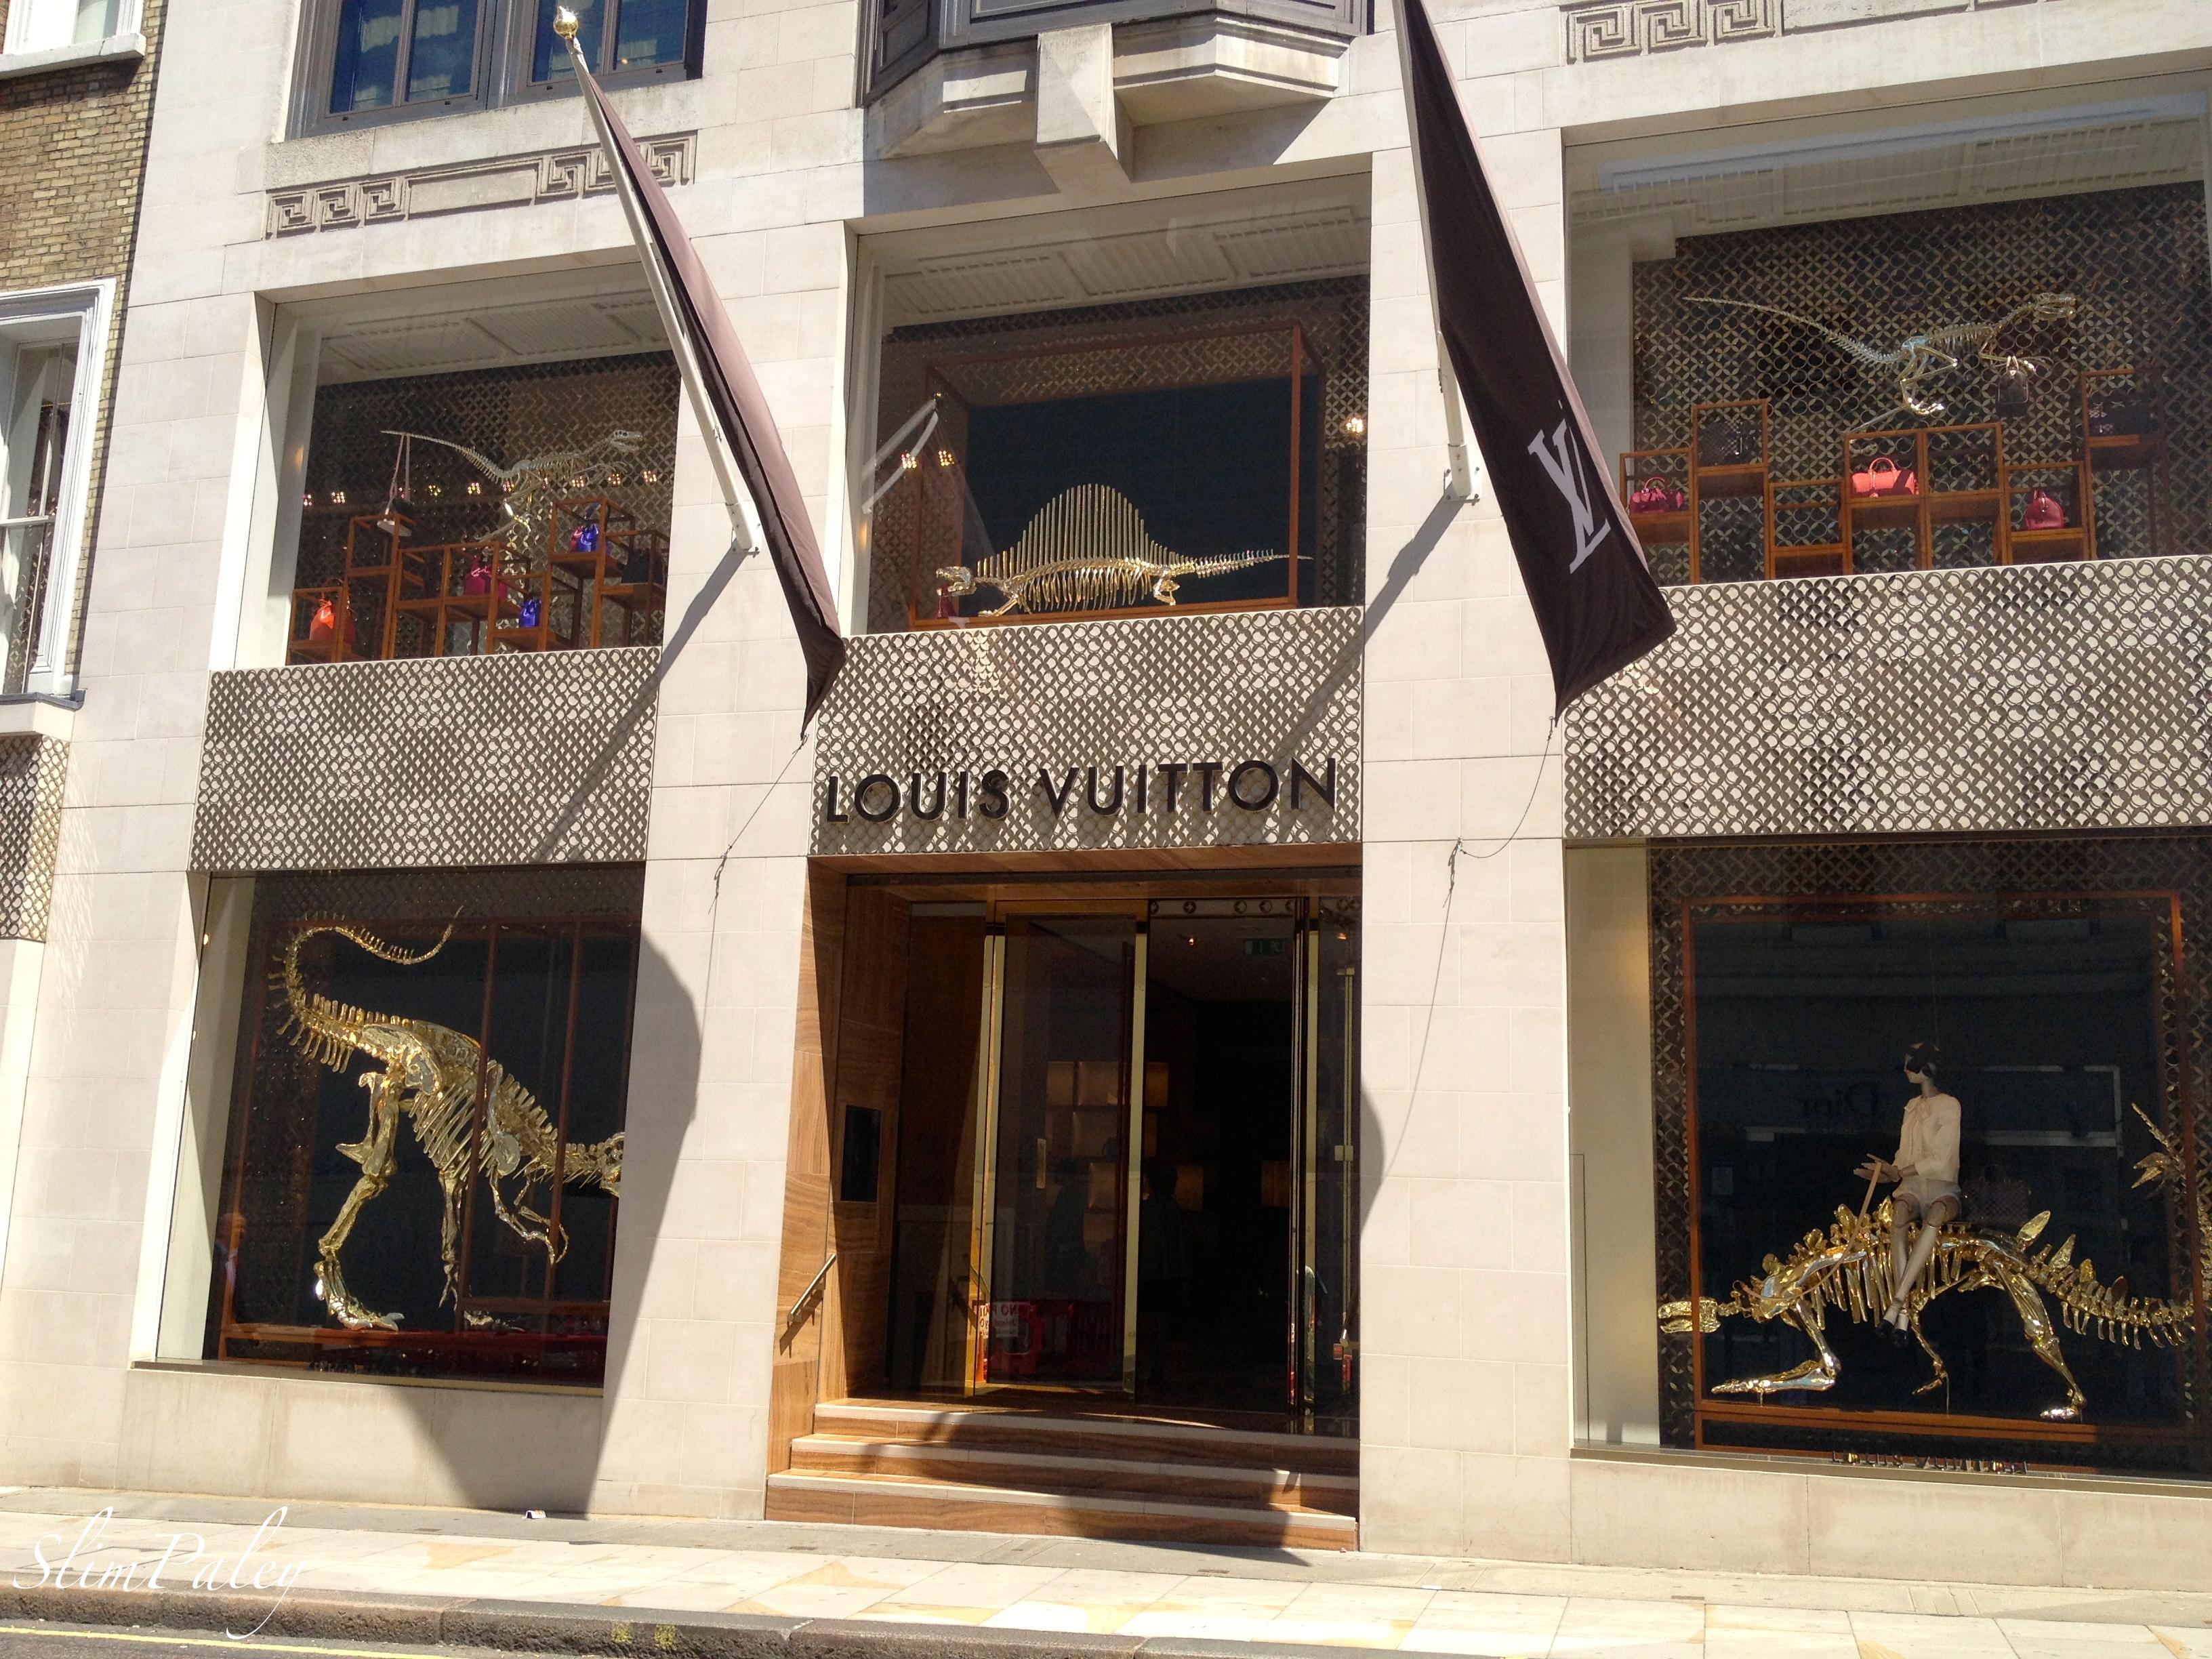 Louis Vuitton windows London